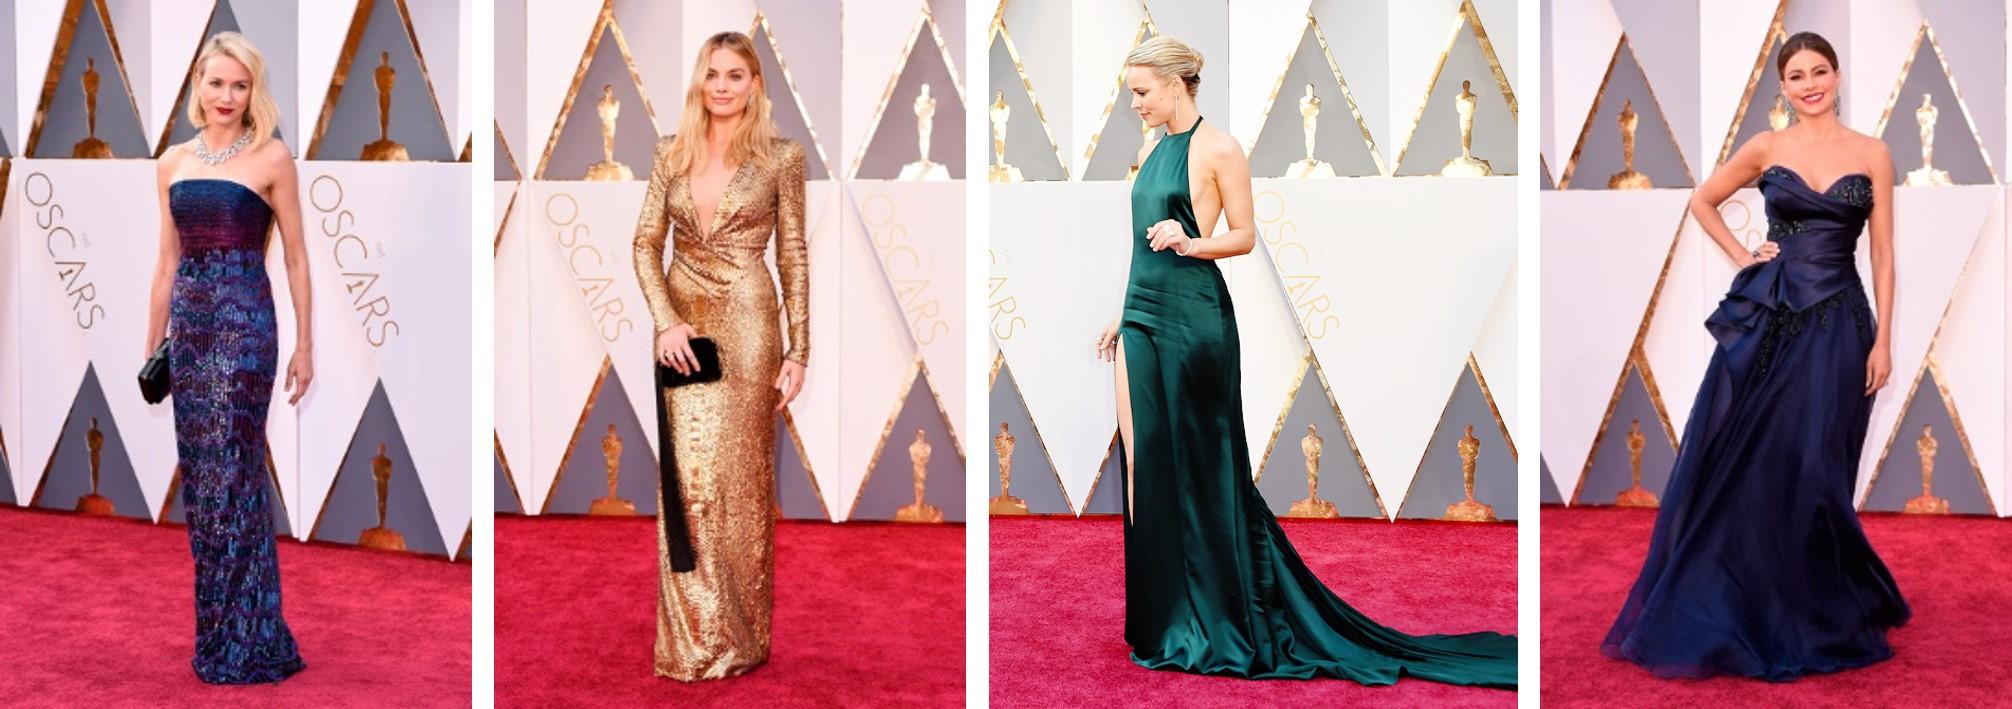 oscars 2016 - Naomi Watts Margot Robbie Rachel McAdams Sofia Vergara - Go with the Blog